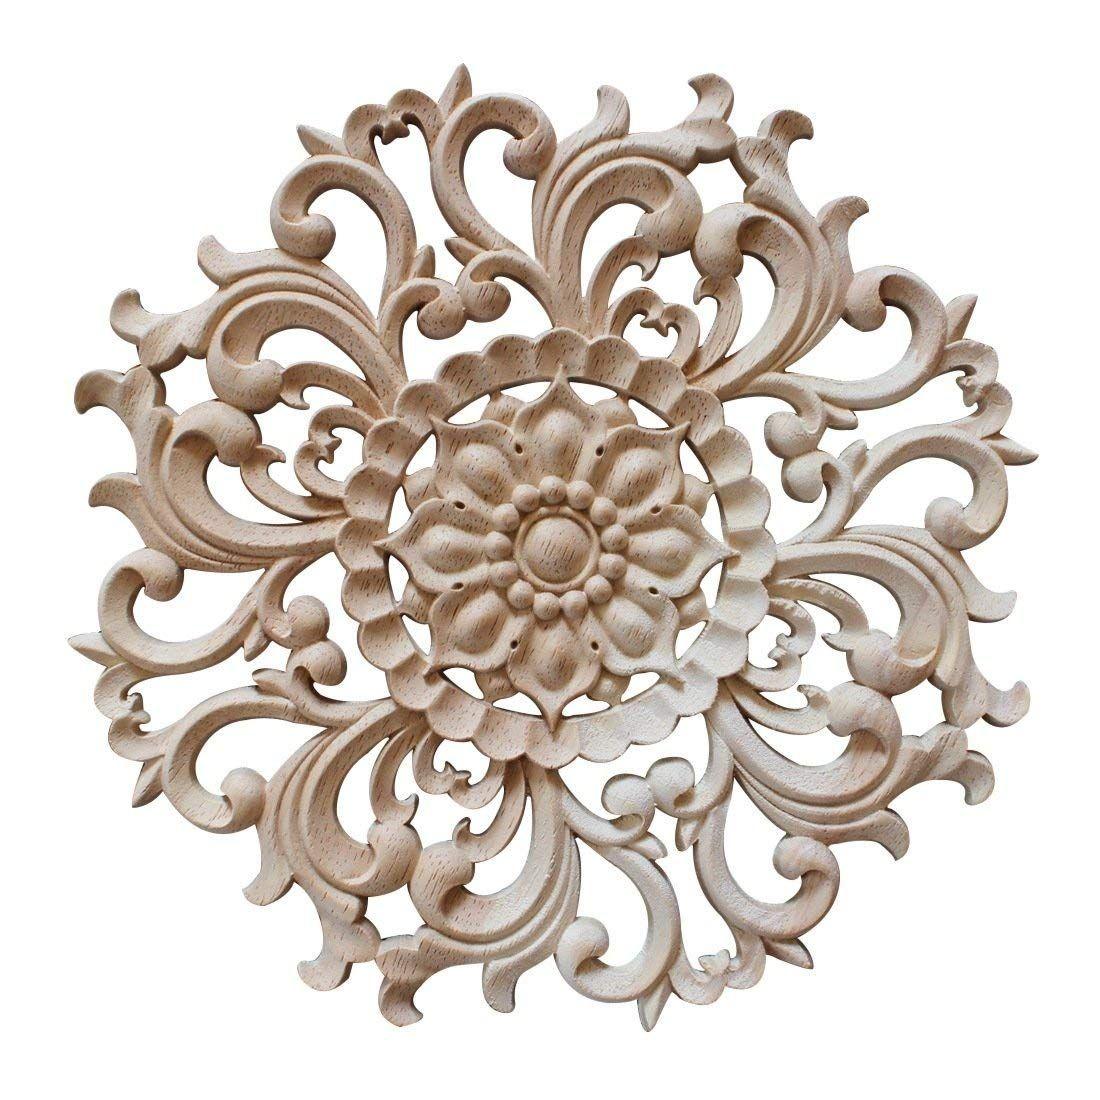 Jiyaru 1pc Wood Carved Flower Decal